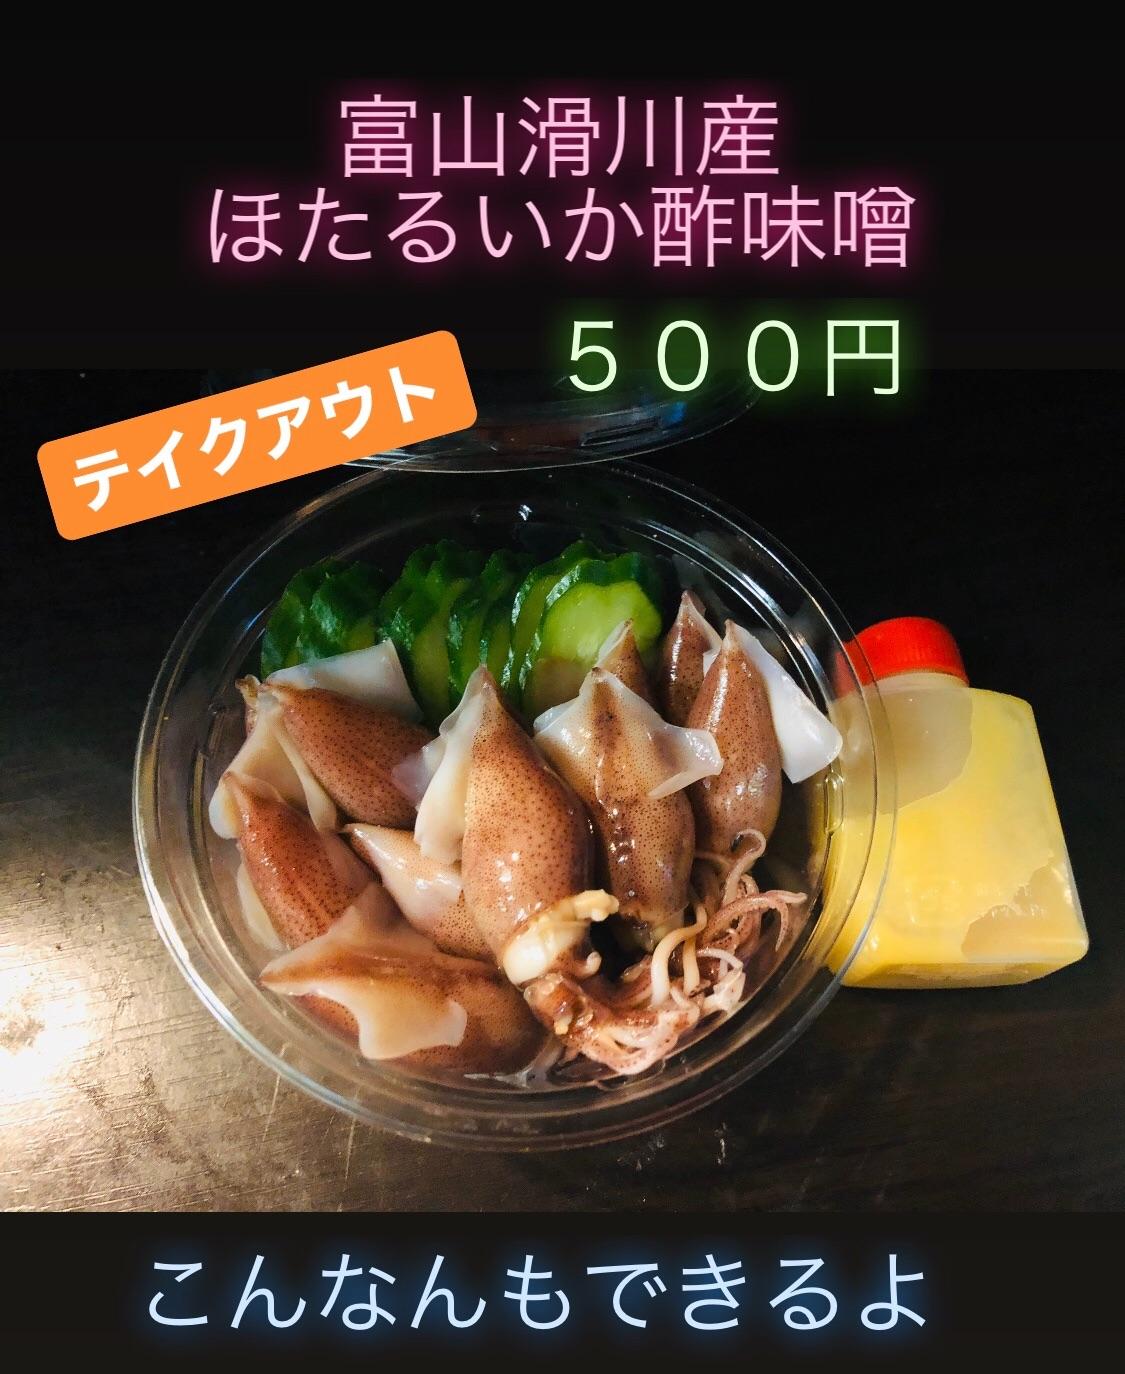 f:id:carp_0301_kenta:20200411143006j:image